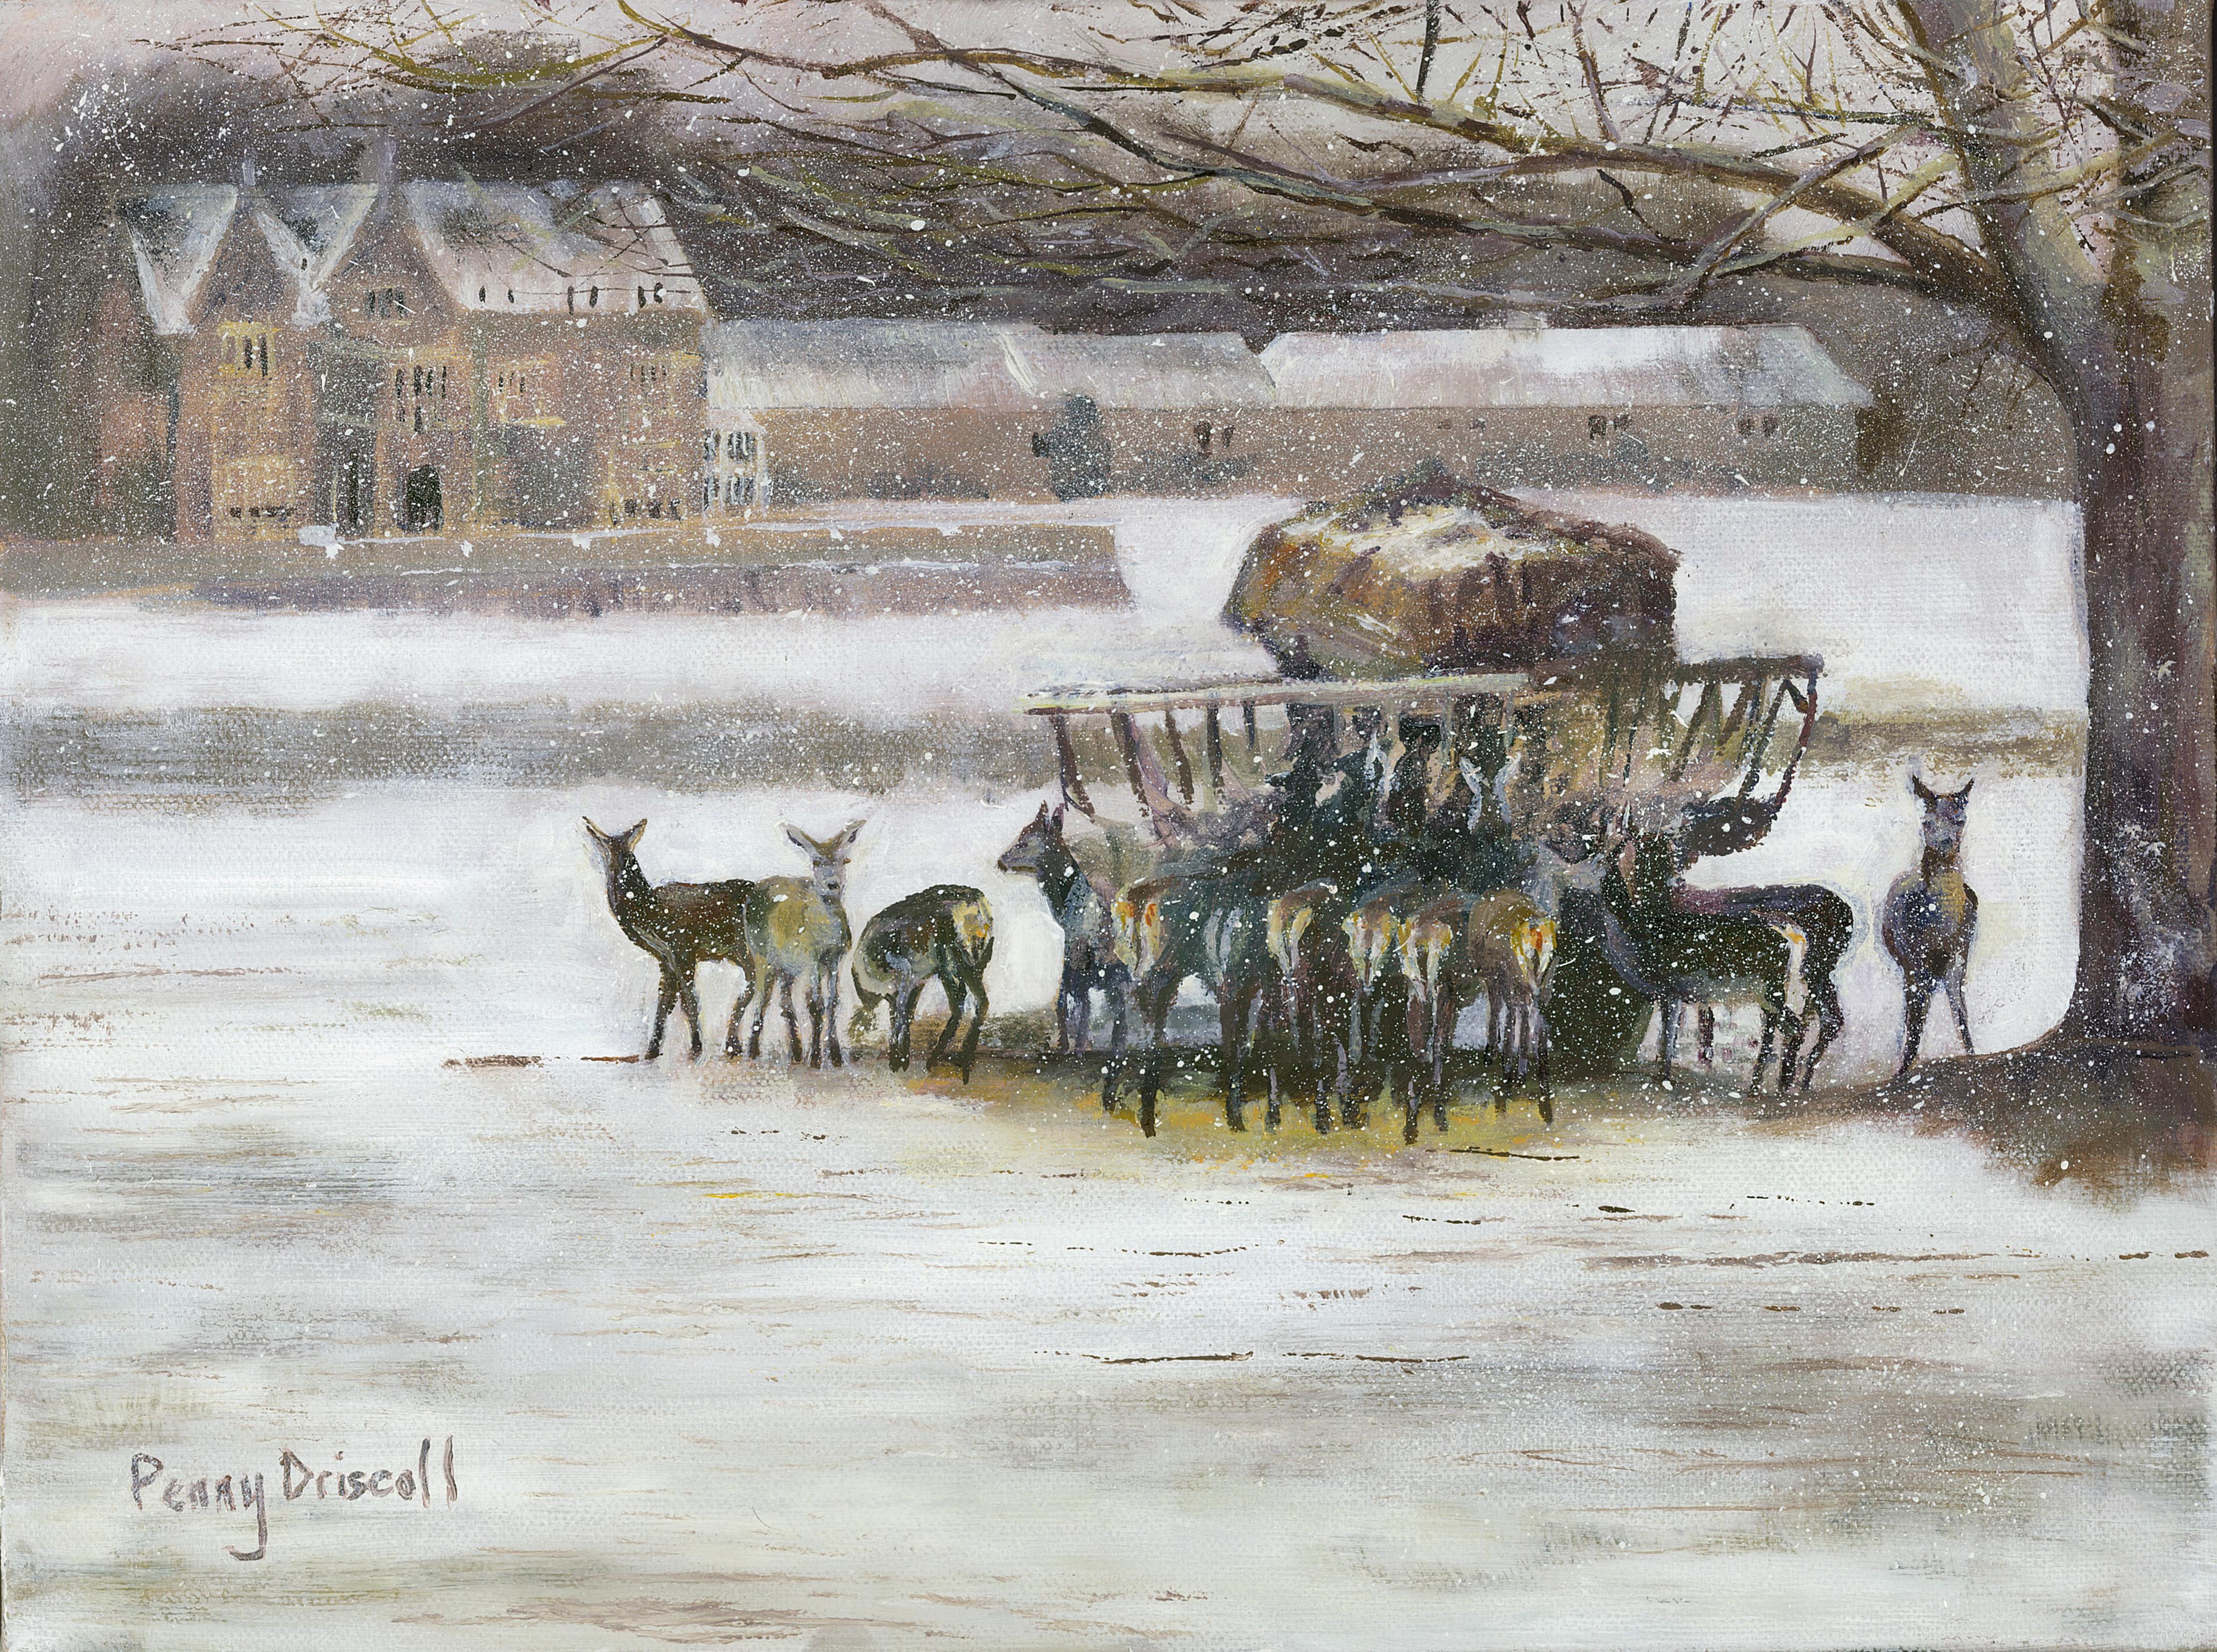 Braving The Blizzard - Penny Driscoll